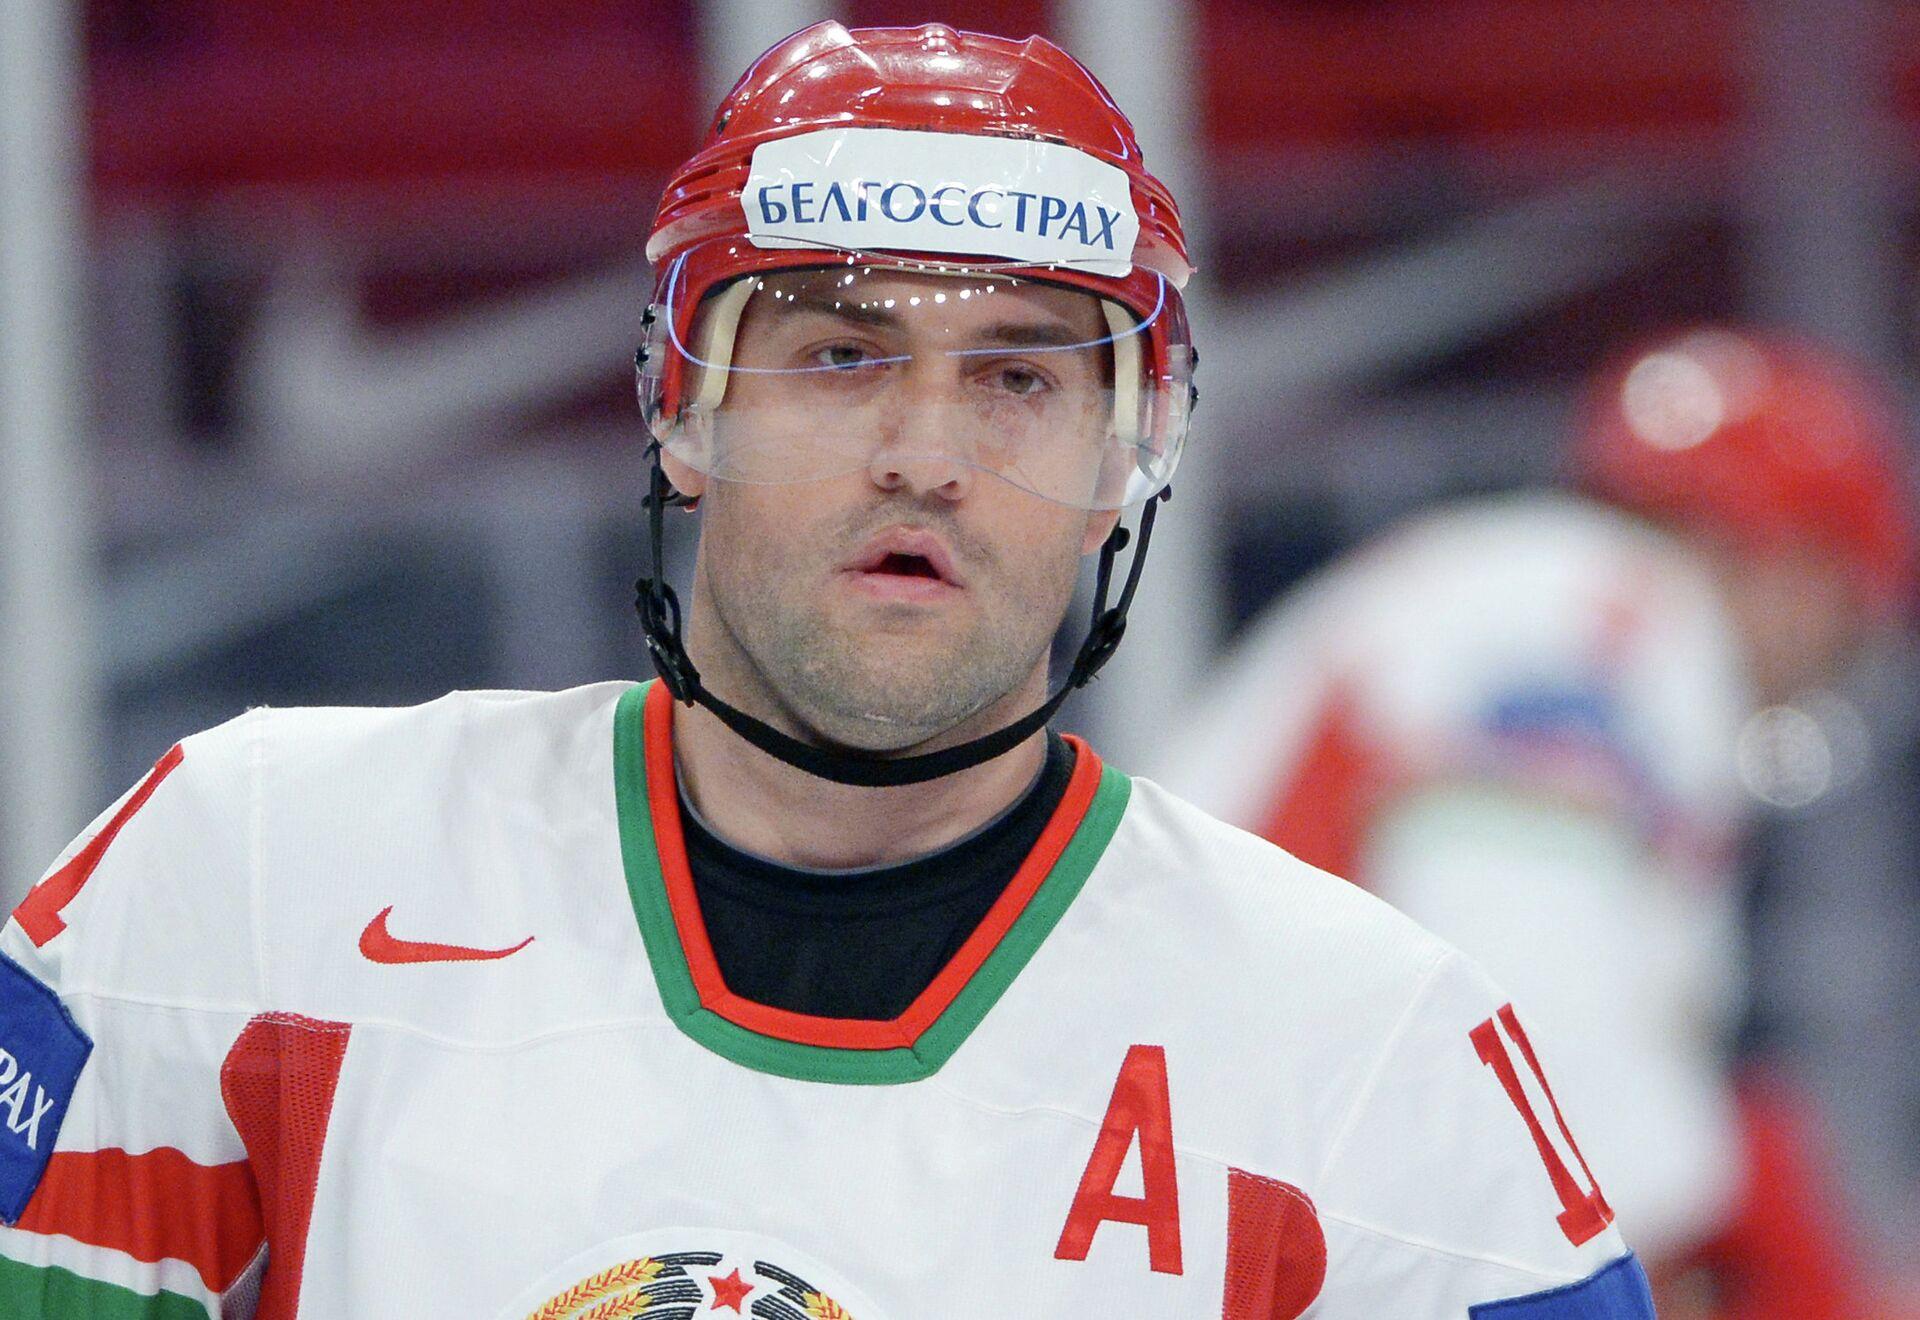 Александр Кулаков (Белоруссия), Динамо (Минск), Хоккей: все о спортсмене - Спорт РИА Новости